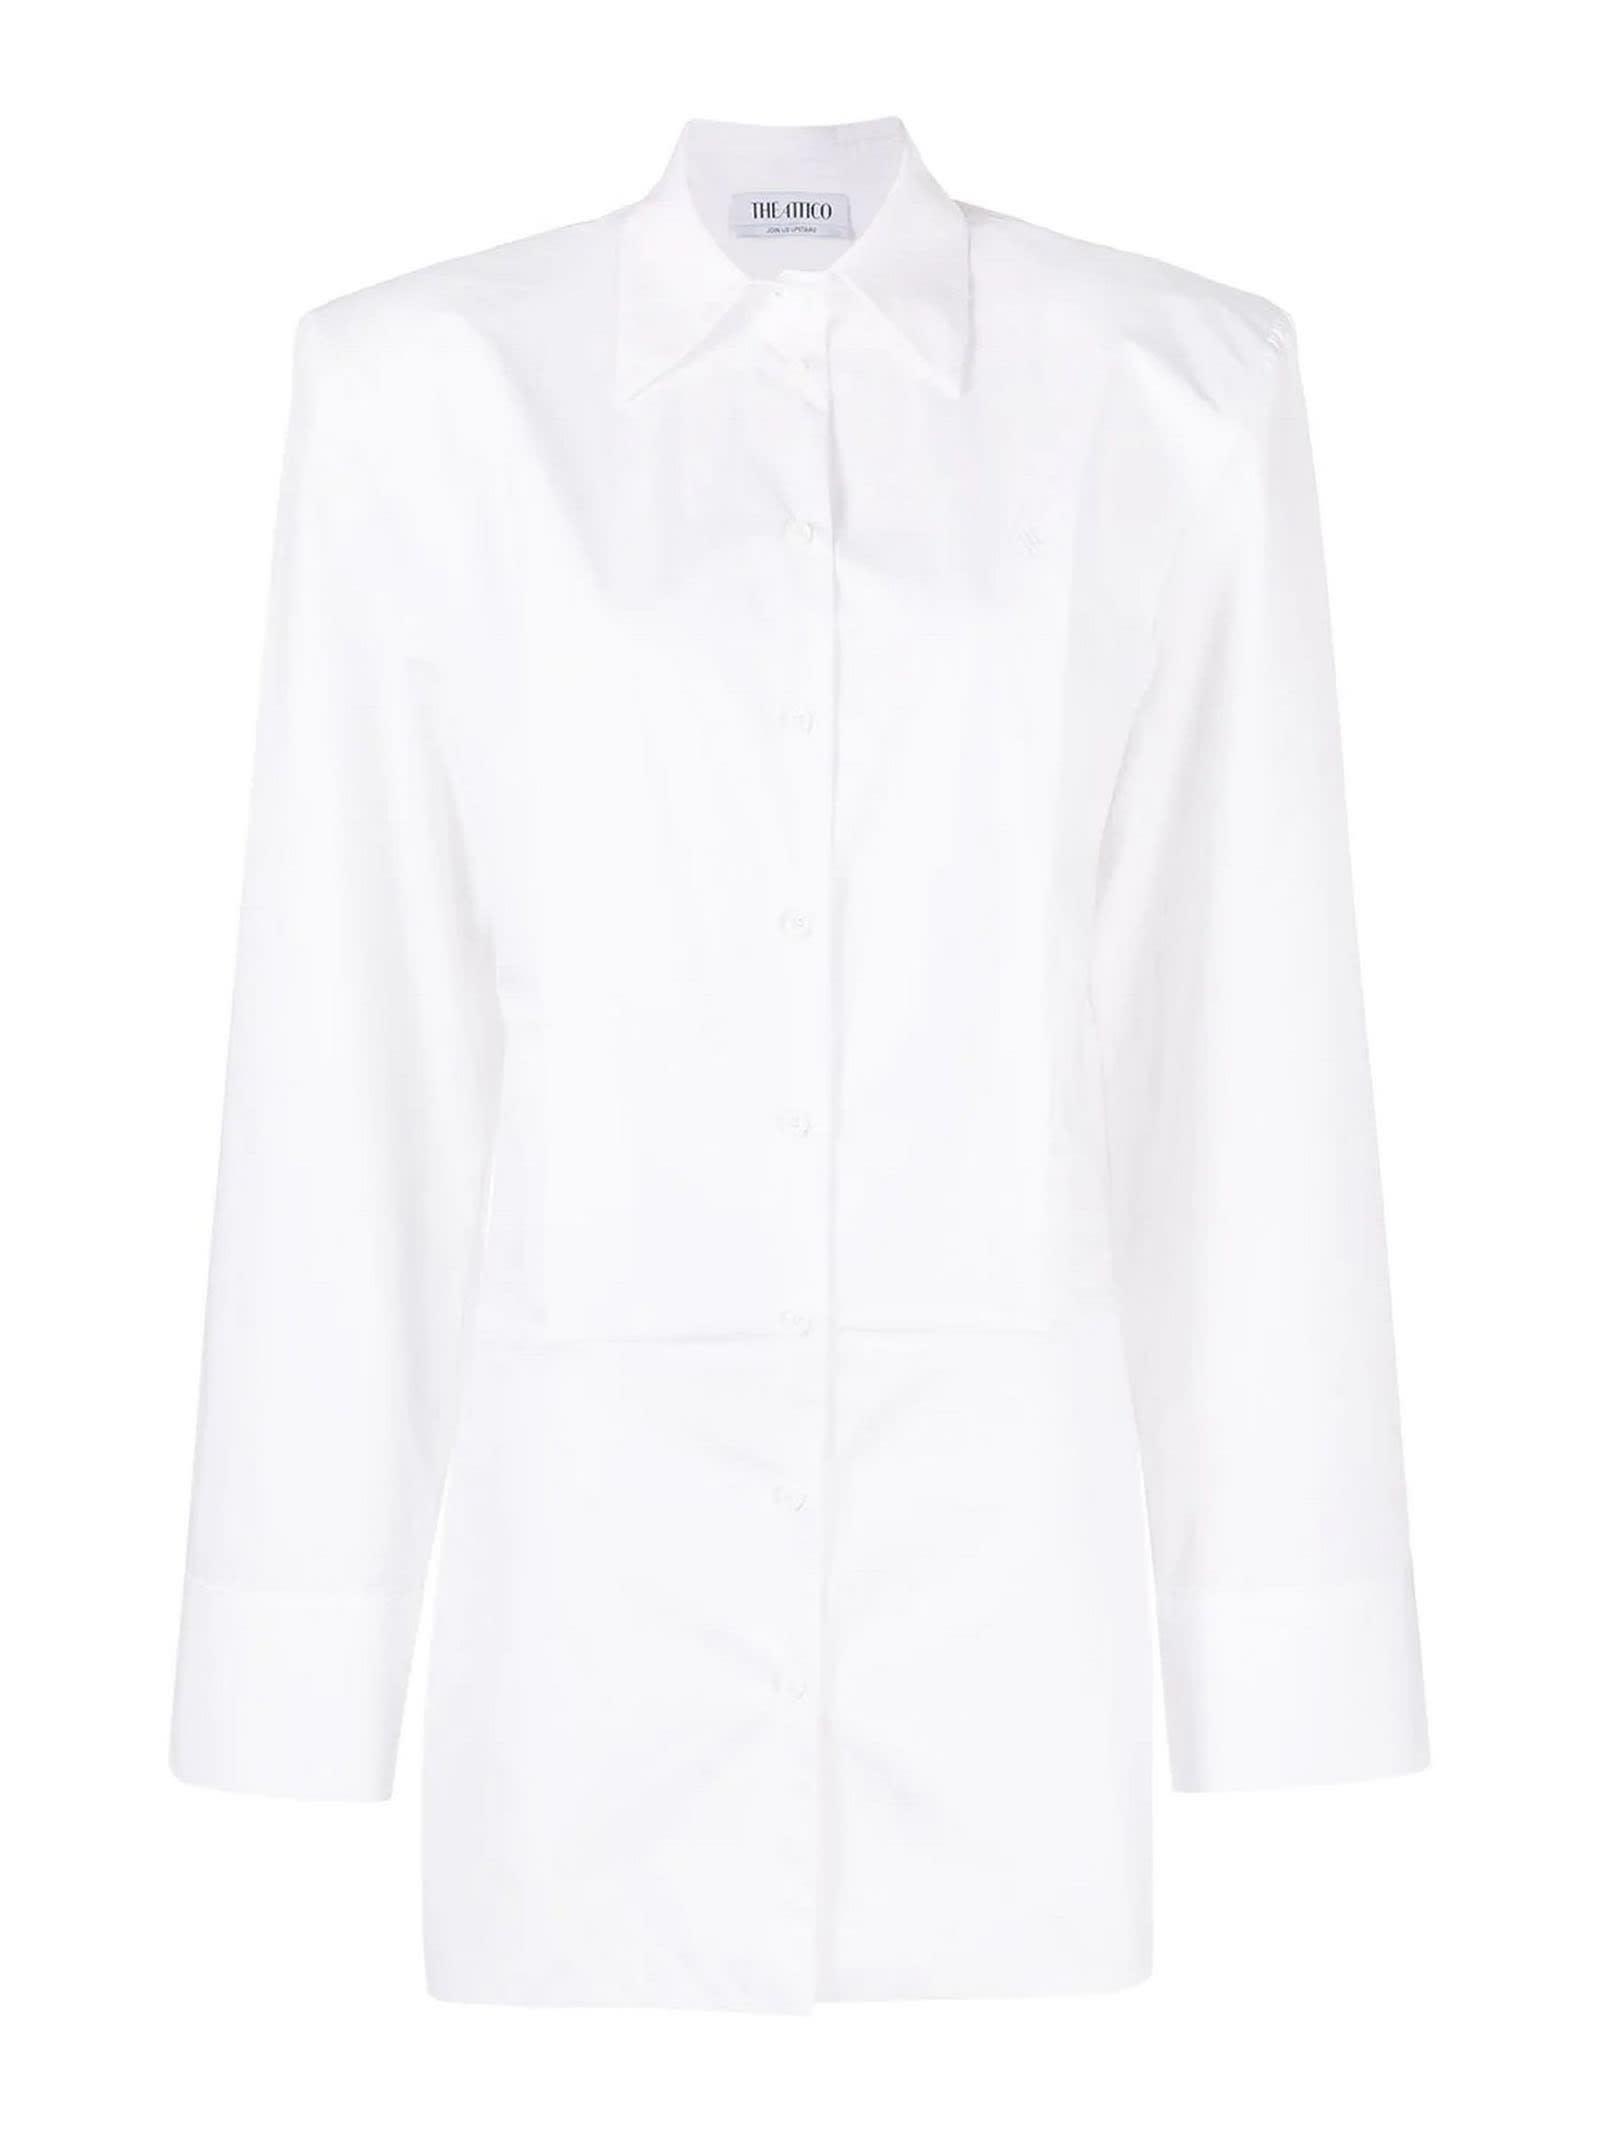 Buy The Attico White Cotton Mini Shirt Dress online, shop The Attico with free shipping